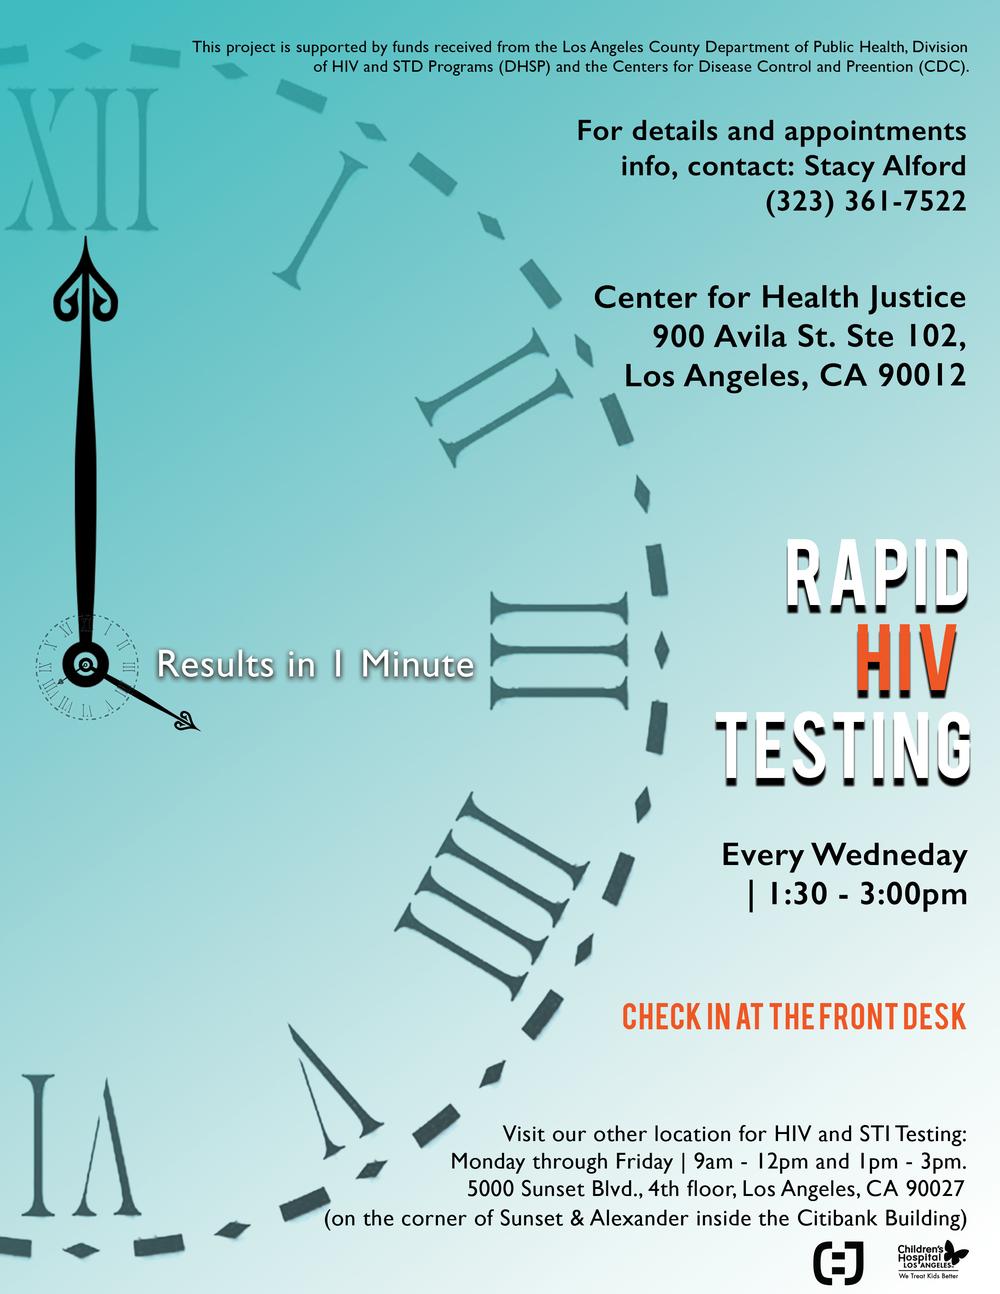 Rapid HIV Testing 2 RBG.jpg